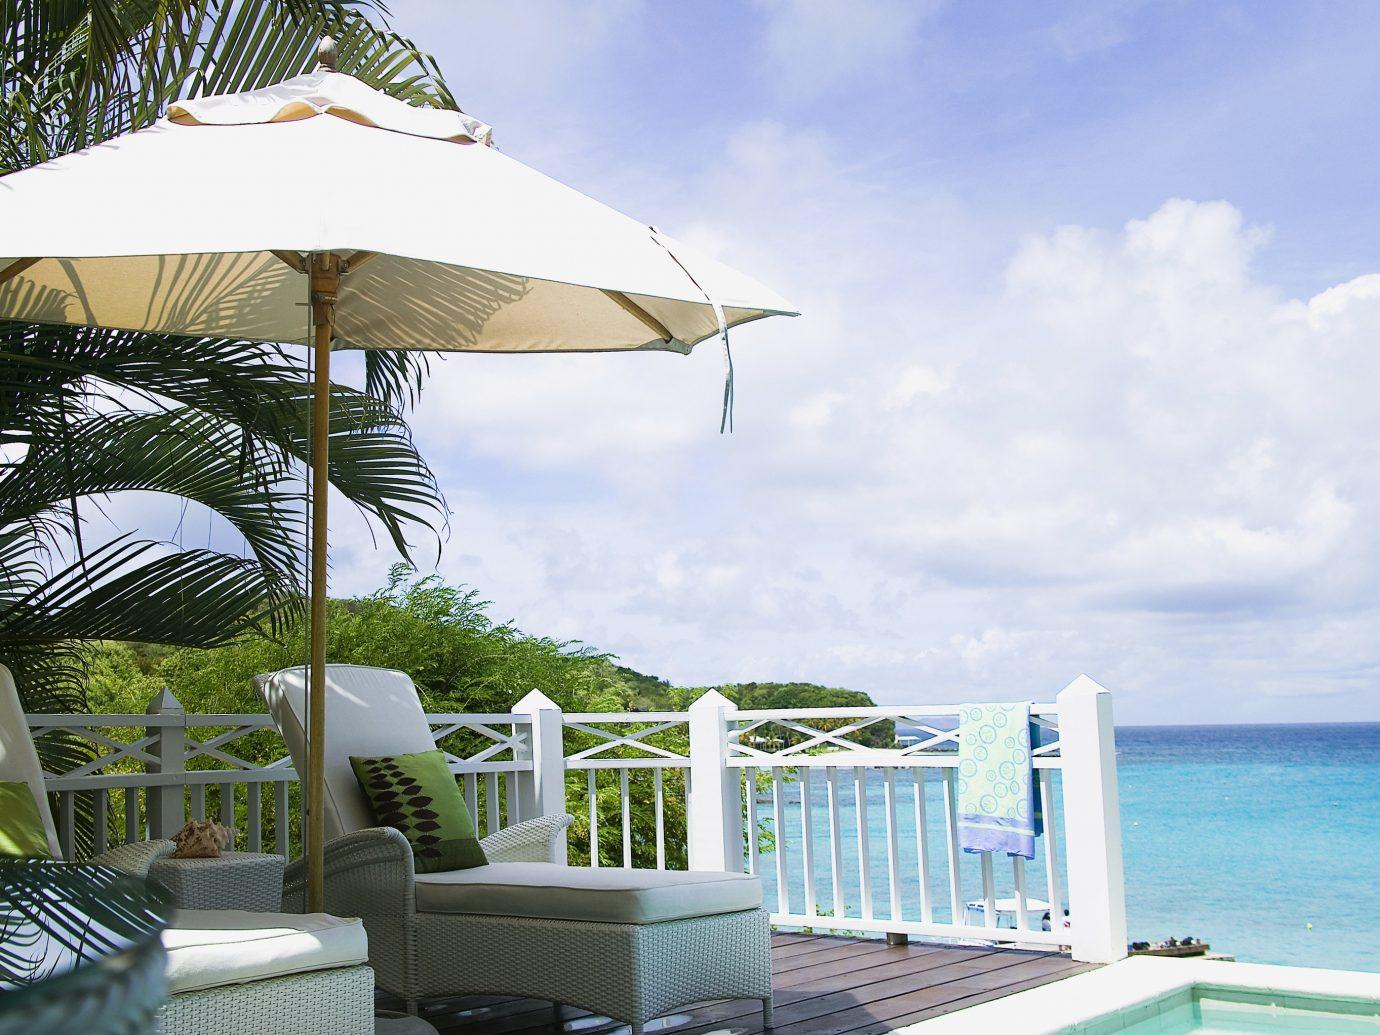 Trip Ideas sky tree chair outdoor Beach vacation caribbean Resort Villa umbrella estate swimming pool Sea cottage accessory furniture